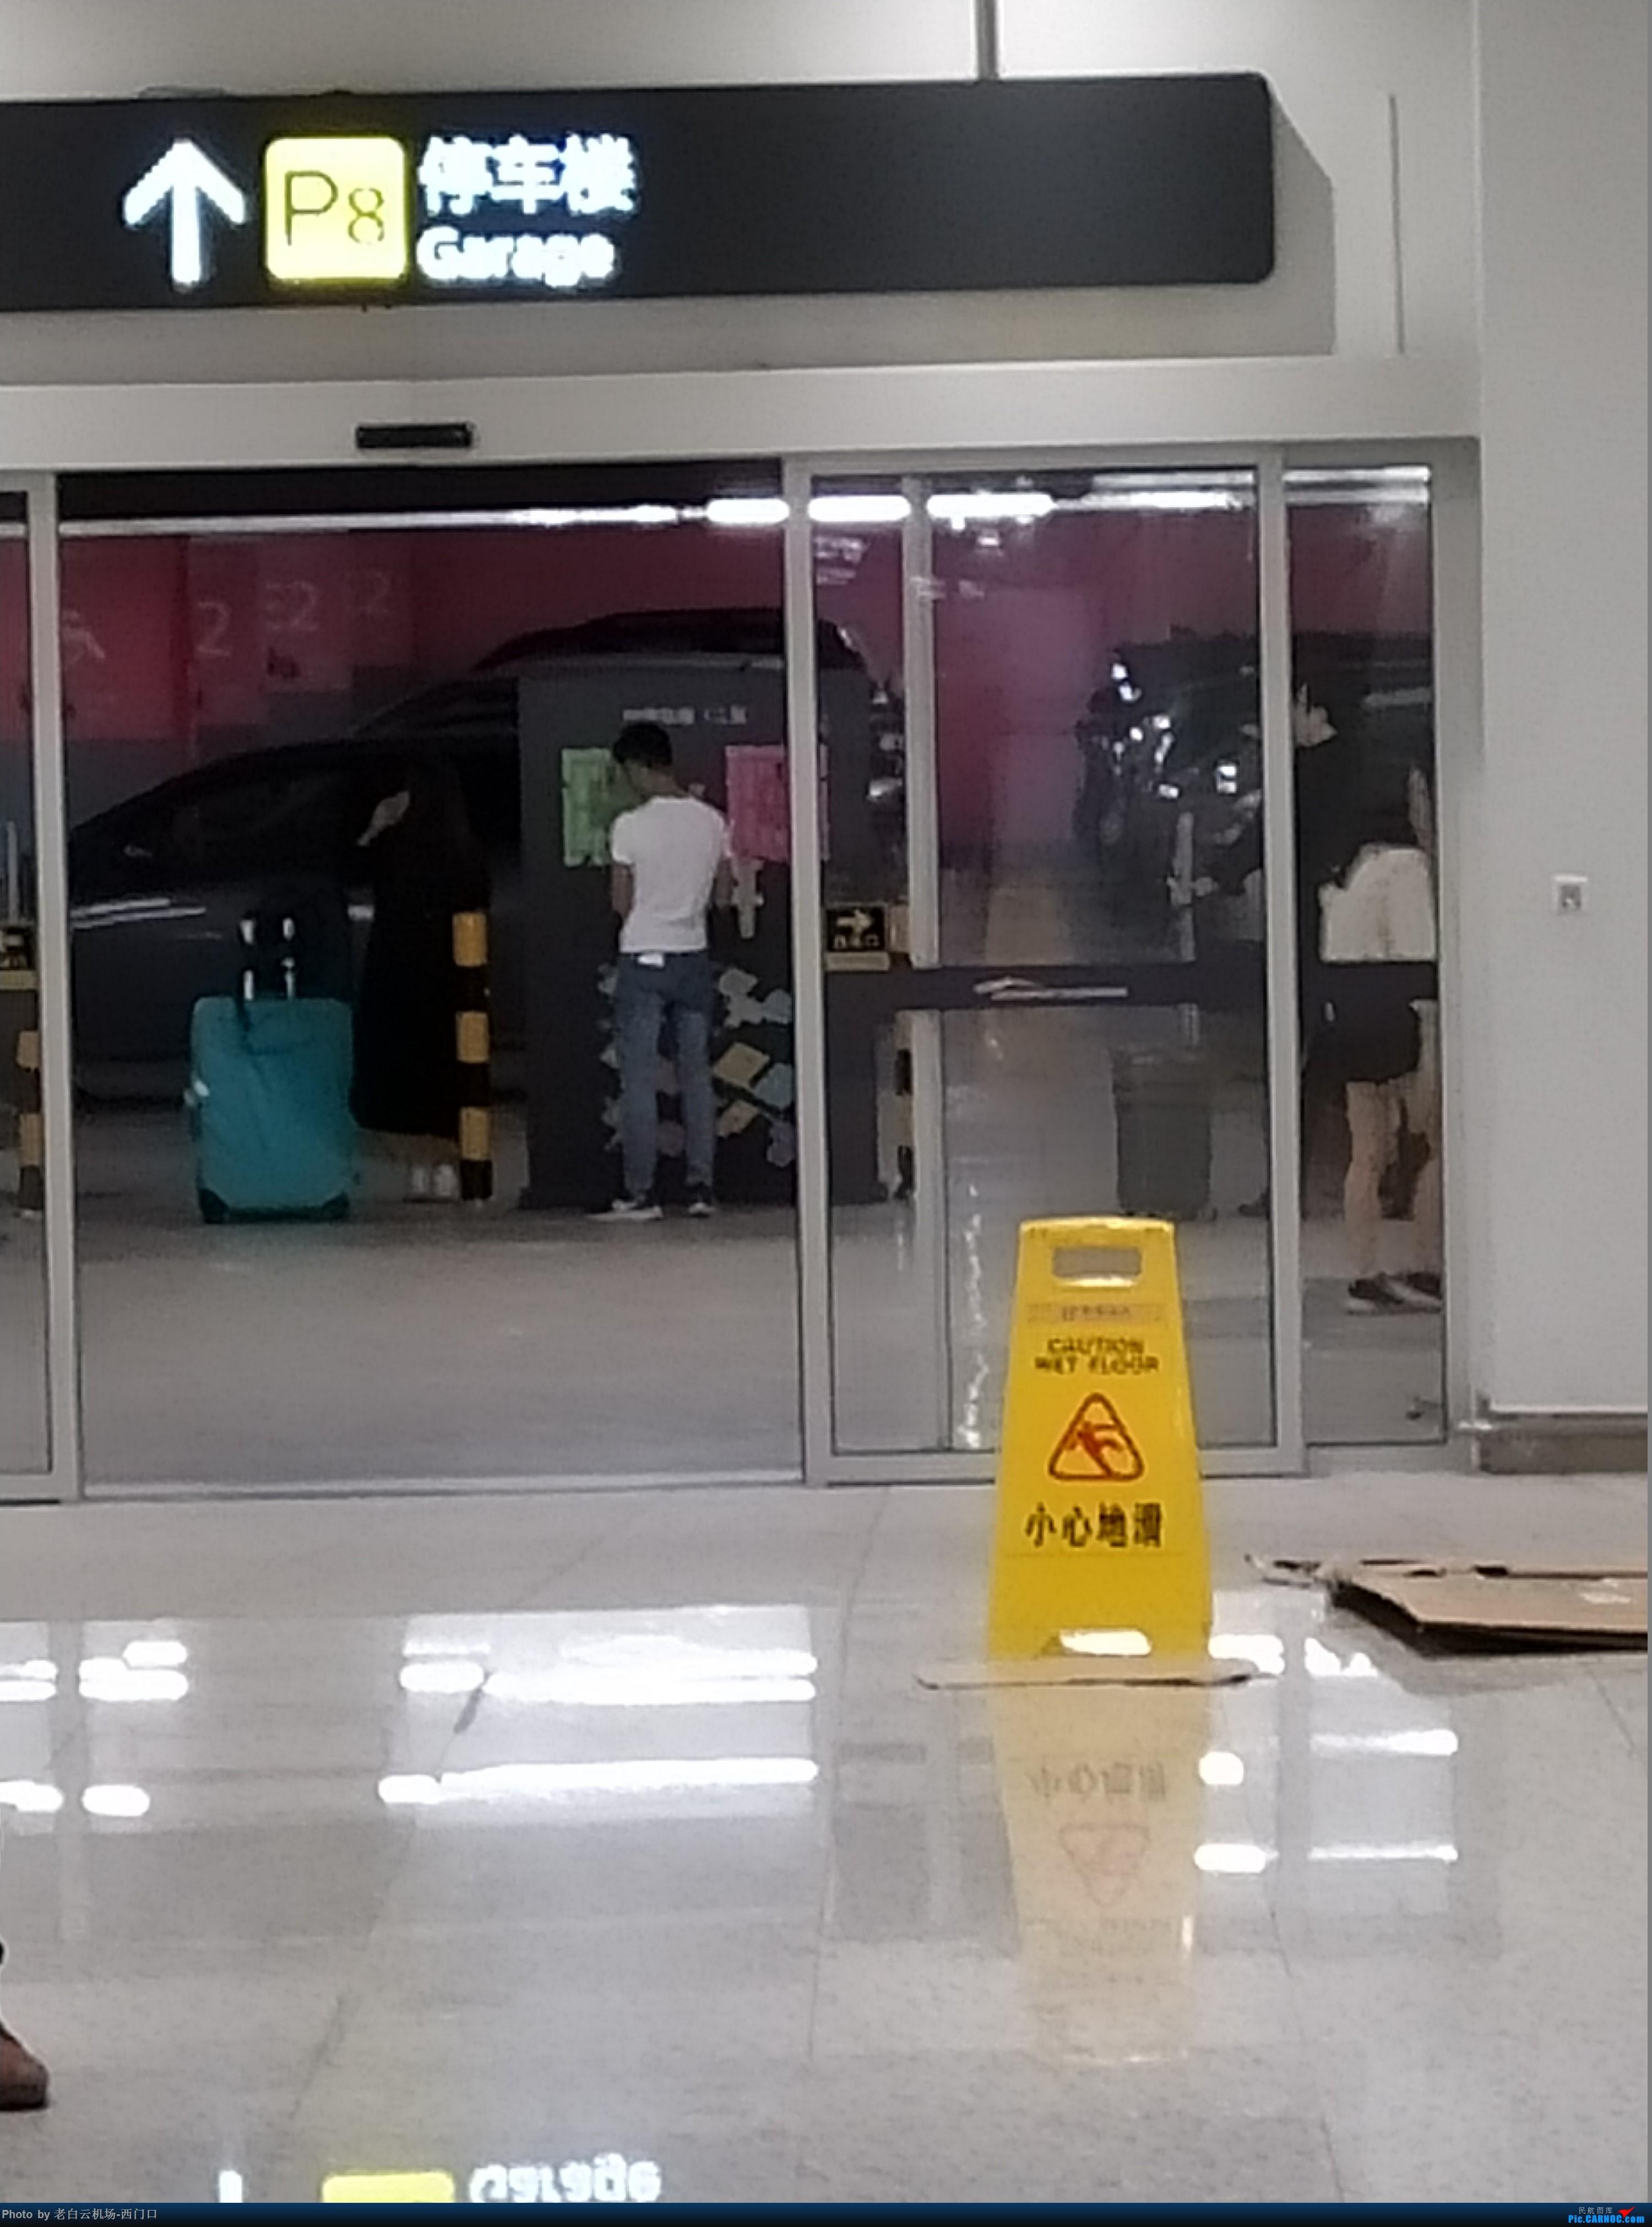 Re:[原创]【梁泽希拍机故事15】2019年第十七次拍机    中国广州白云国际机场